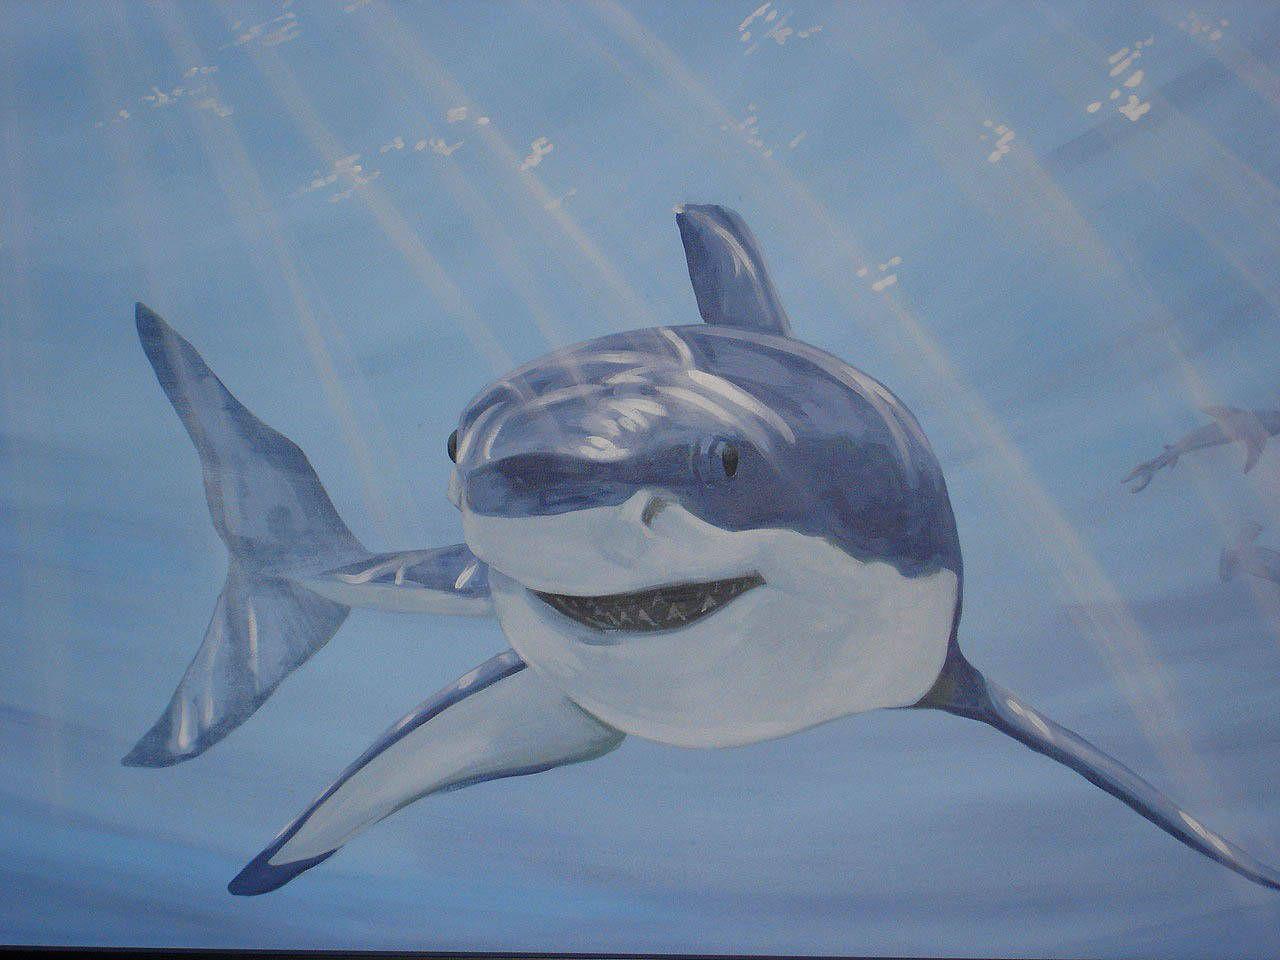 Shark Mural - Detail Image